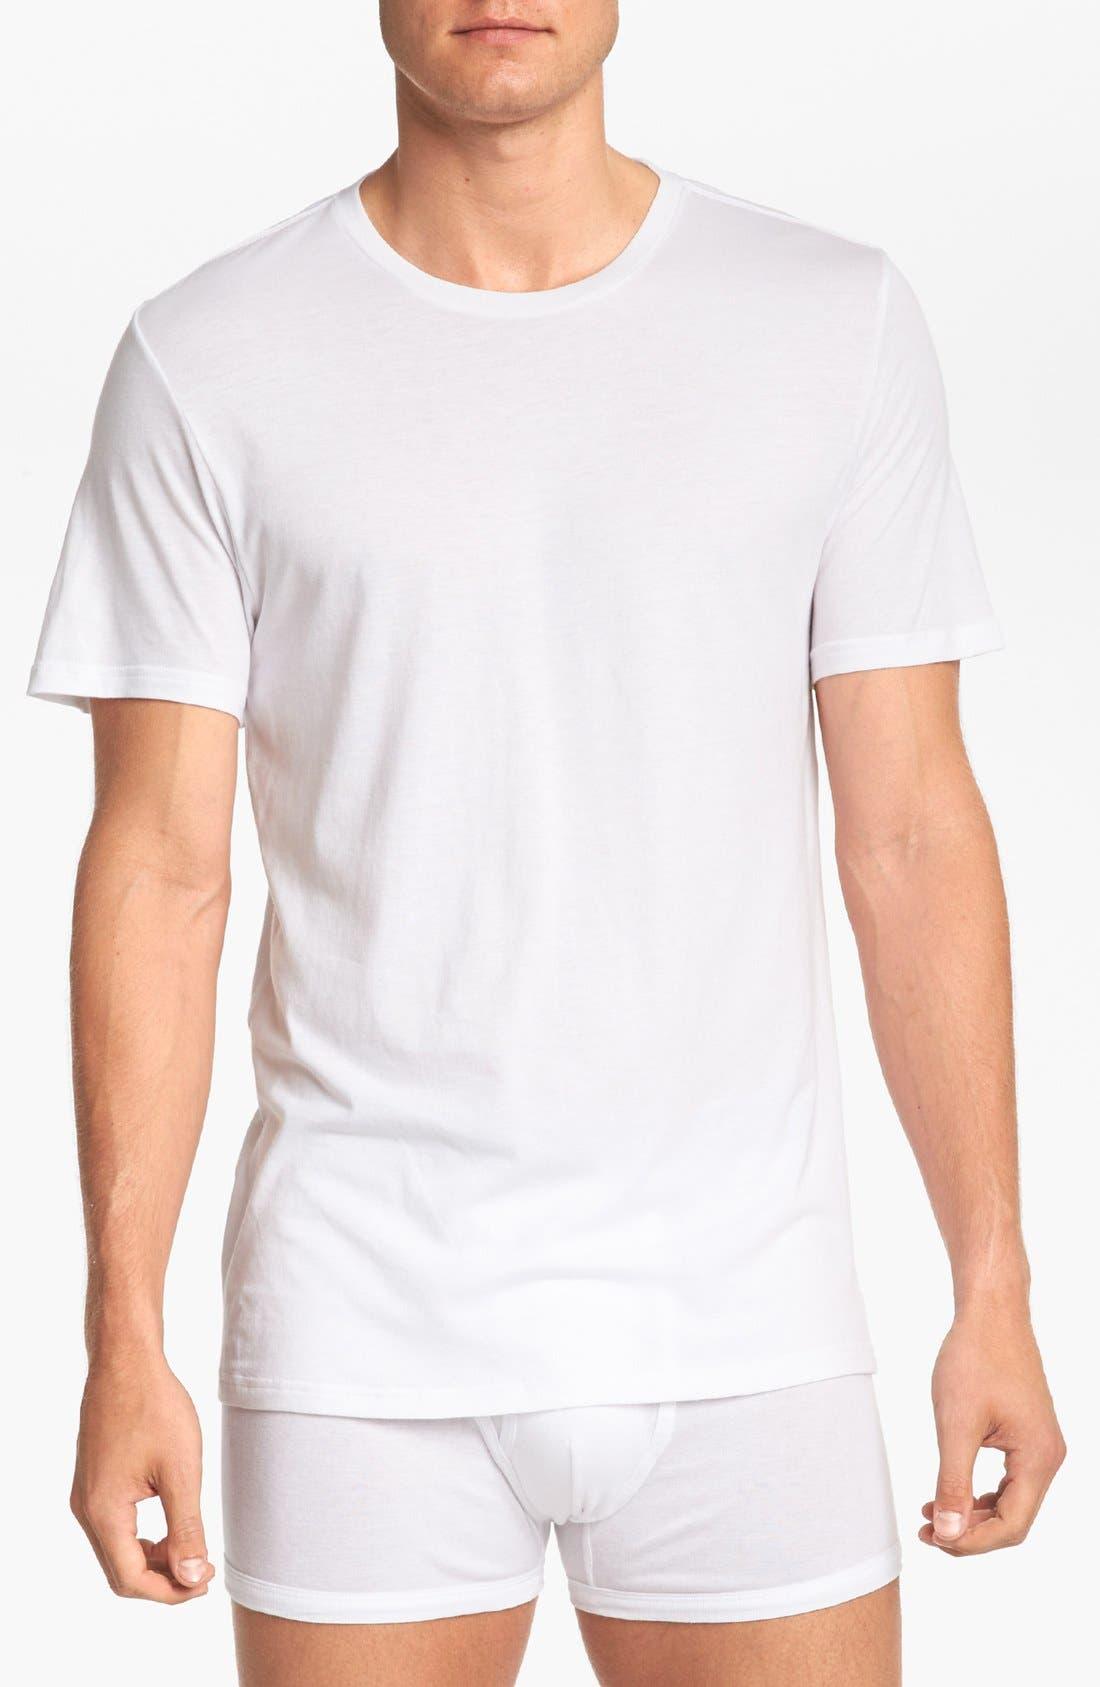 Alternate Image 1 Selected - Michael Kors 'Soft Touch' Crewneck T-Shirt (3-Pack)